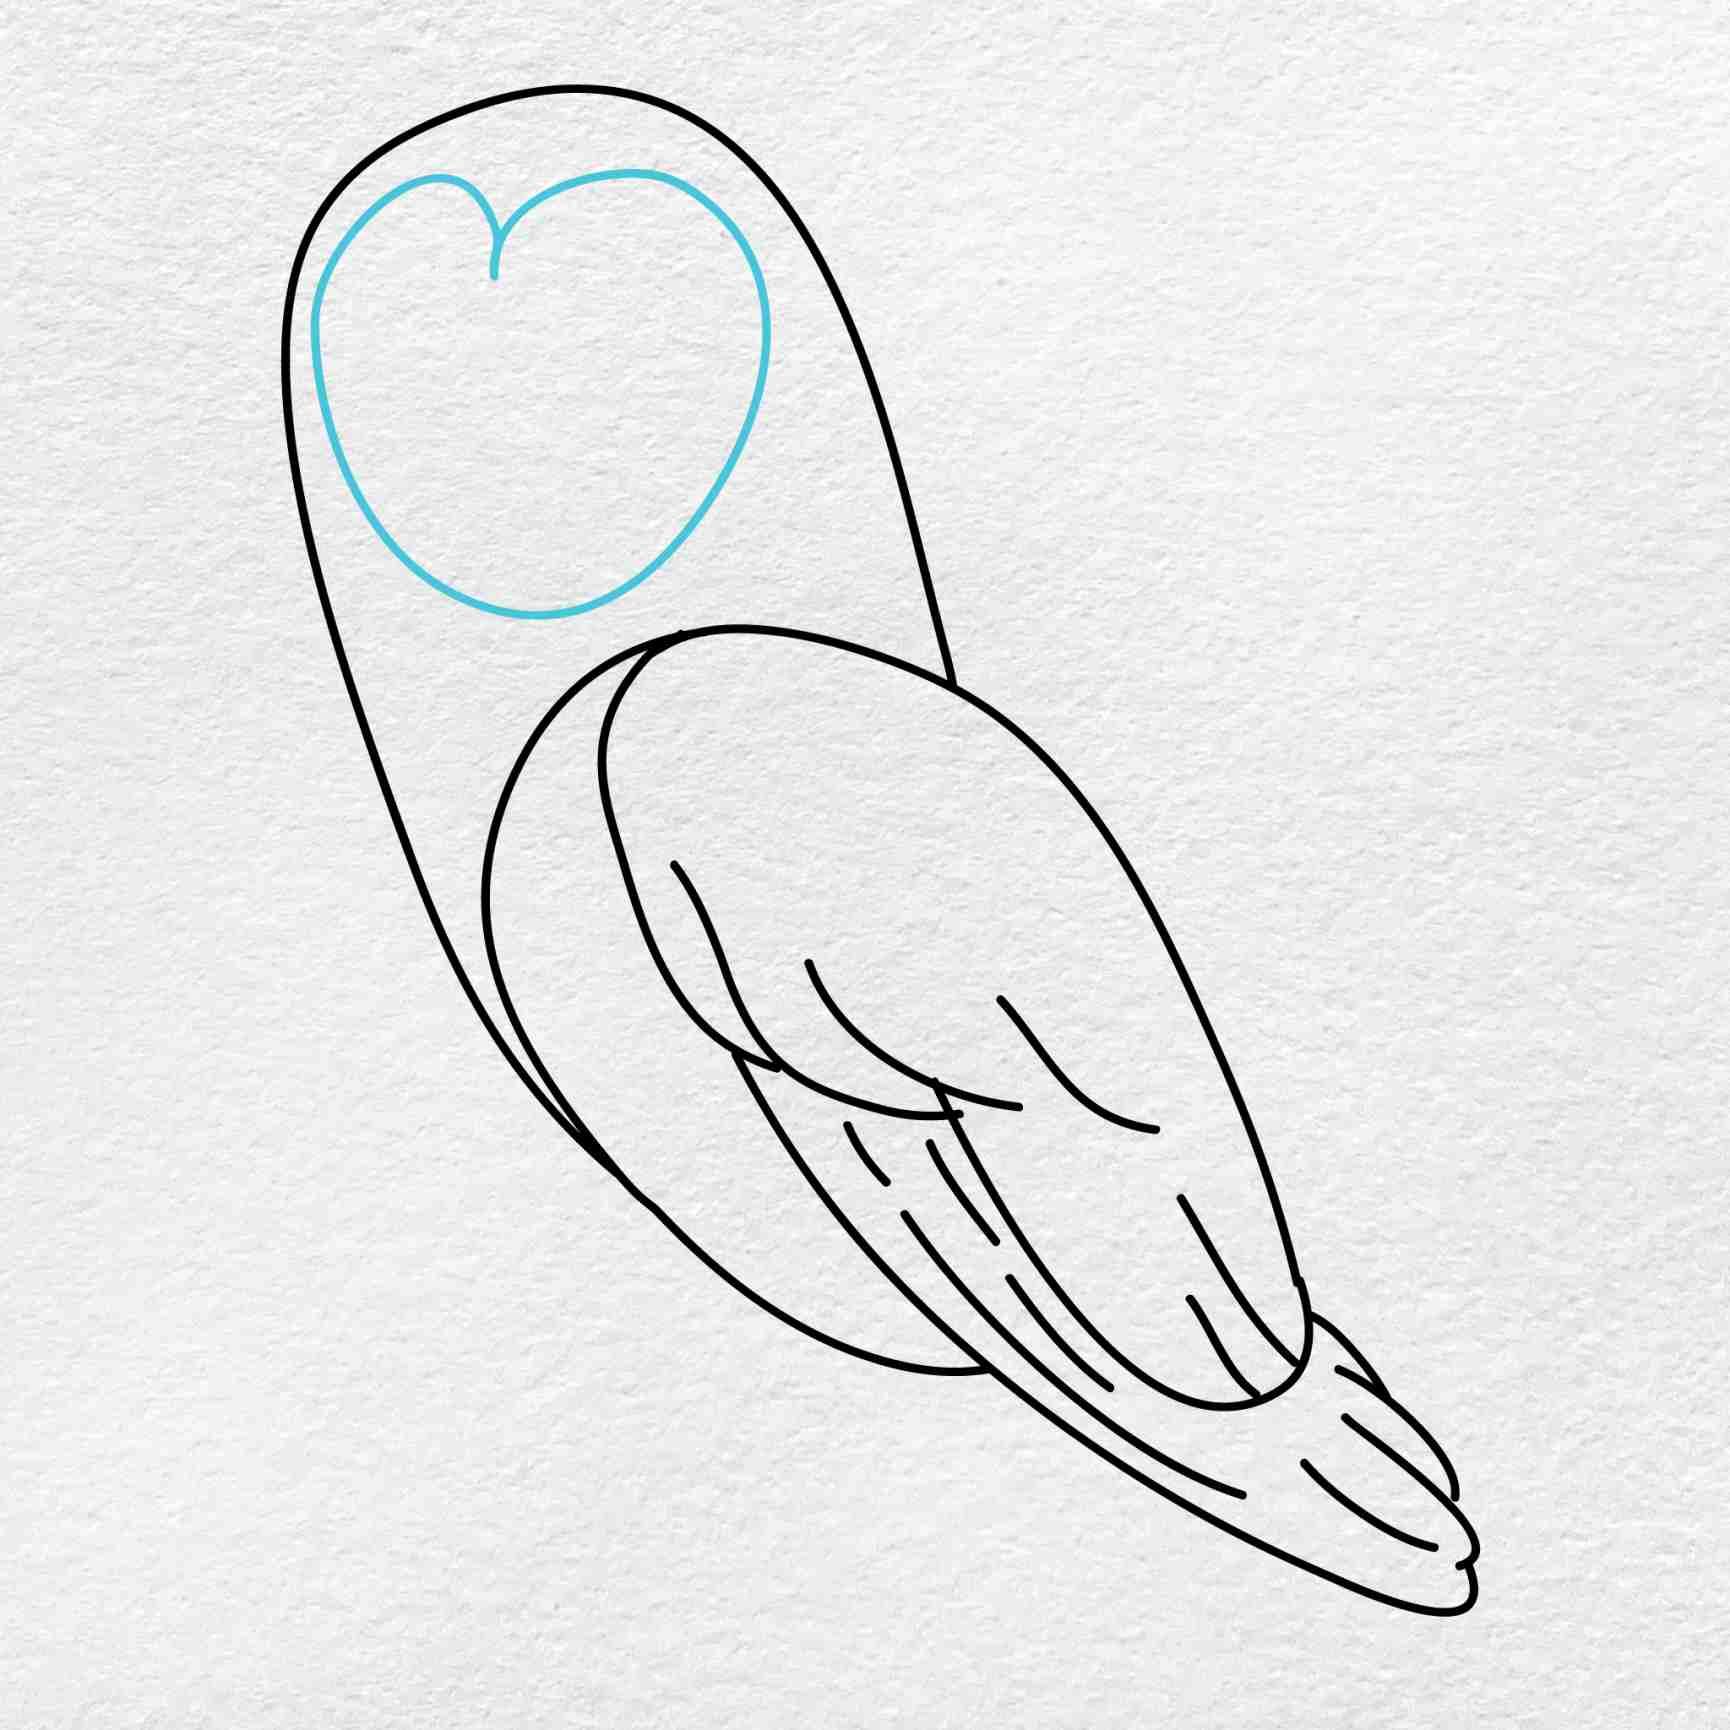 Barn Owl Drawing: Step 5